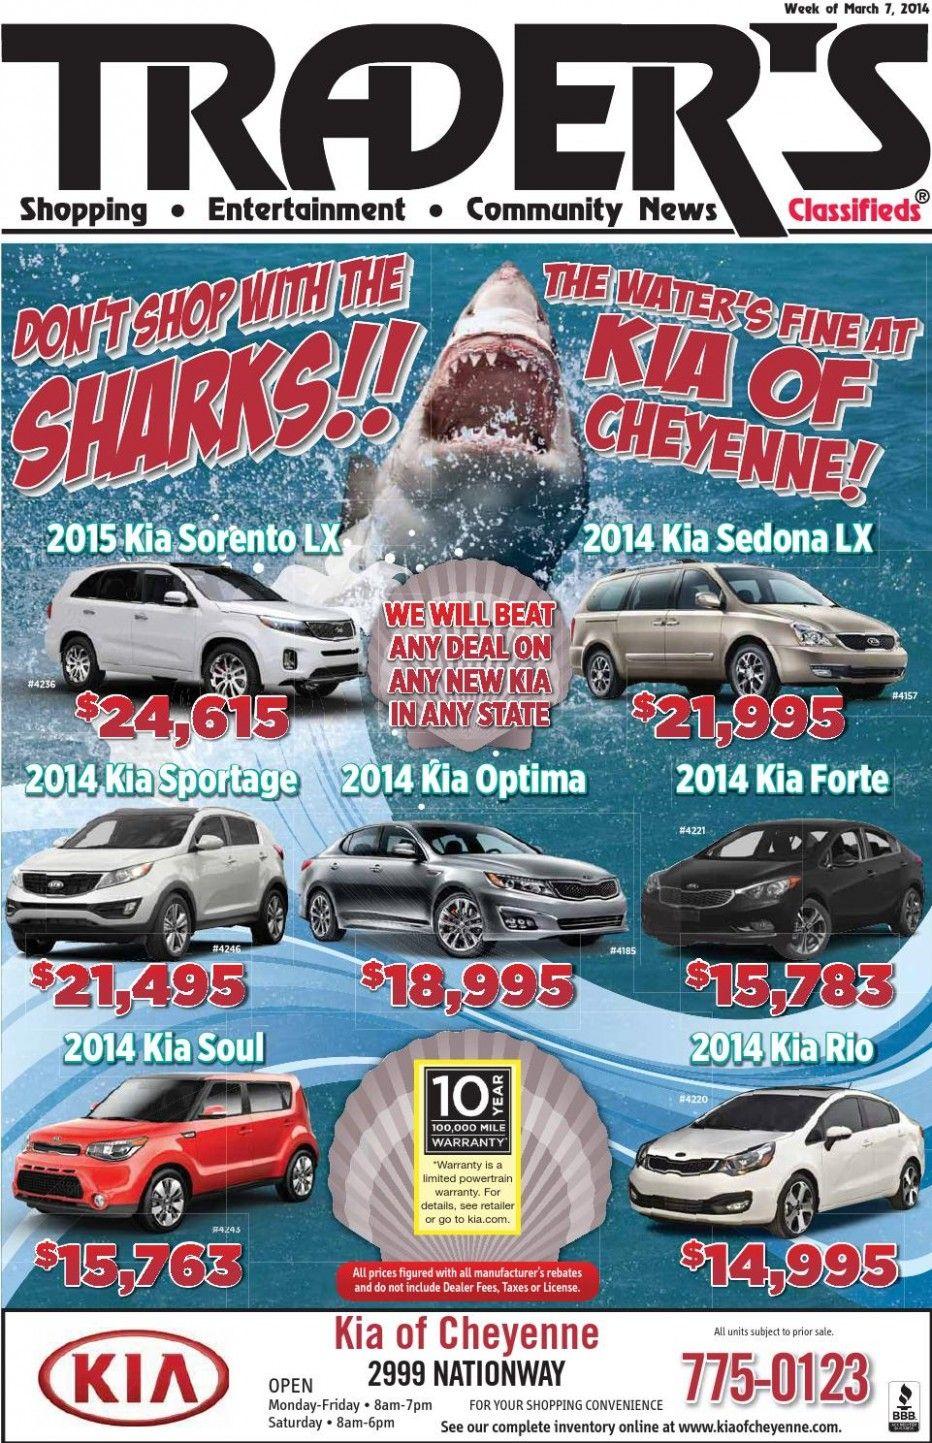 Chevrolet Aveo 2020 Price In Qatar In 2020 Chevrolet Aveo